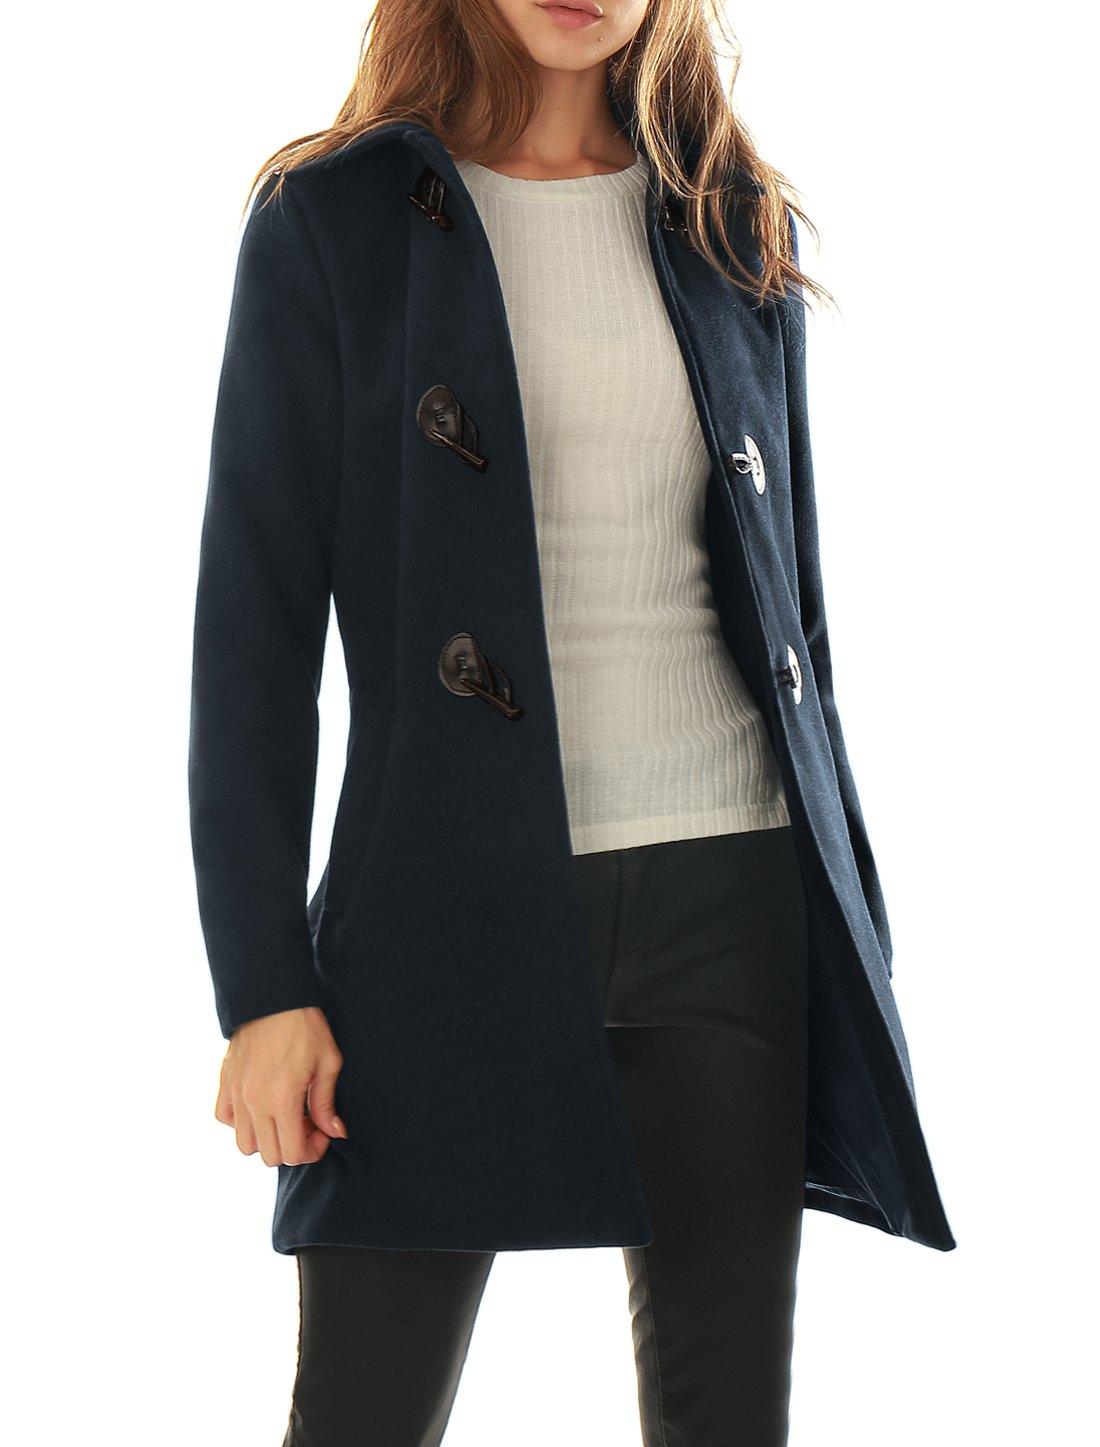 Allegra K Women's Turn Down Collar Slant Pockets Longline Toggle Coat XXS Blue